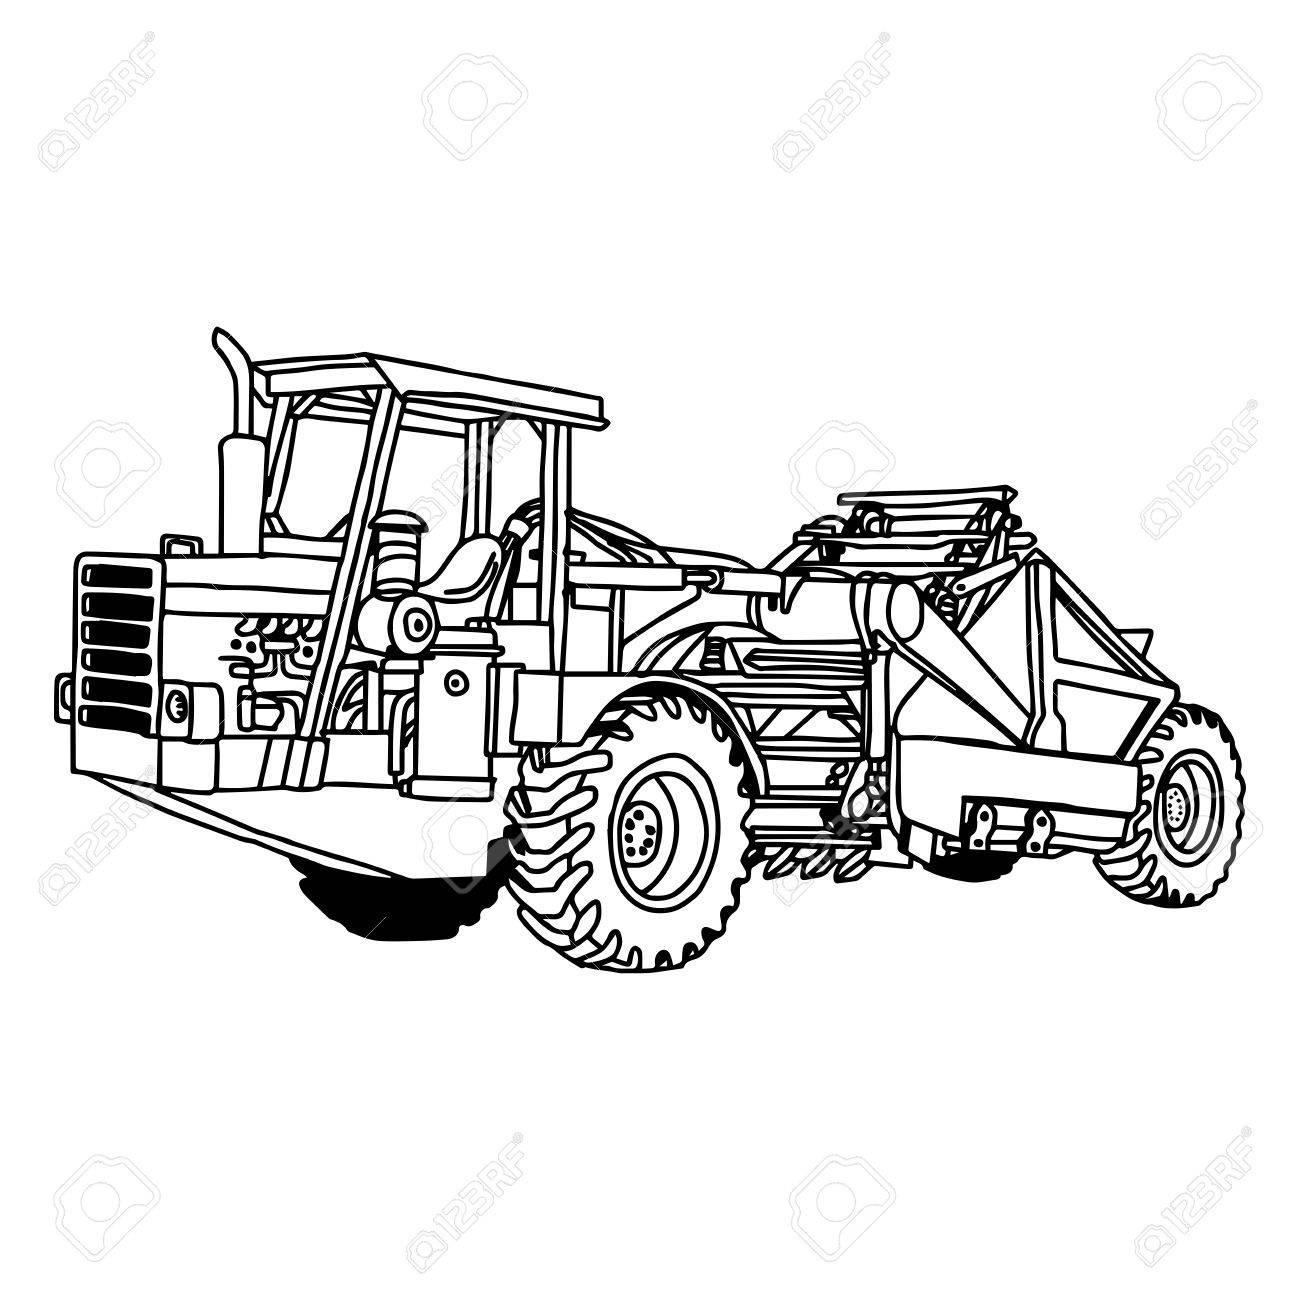 Wheel Loader Drawing At Getdrawings